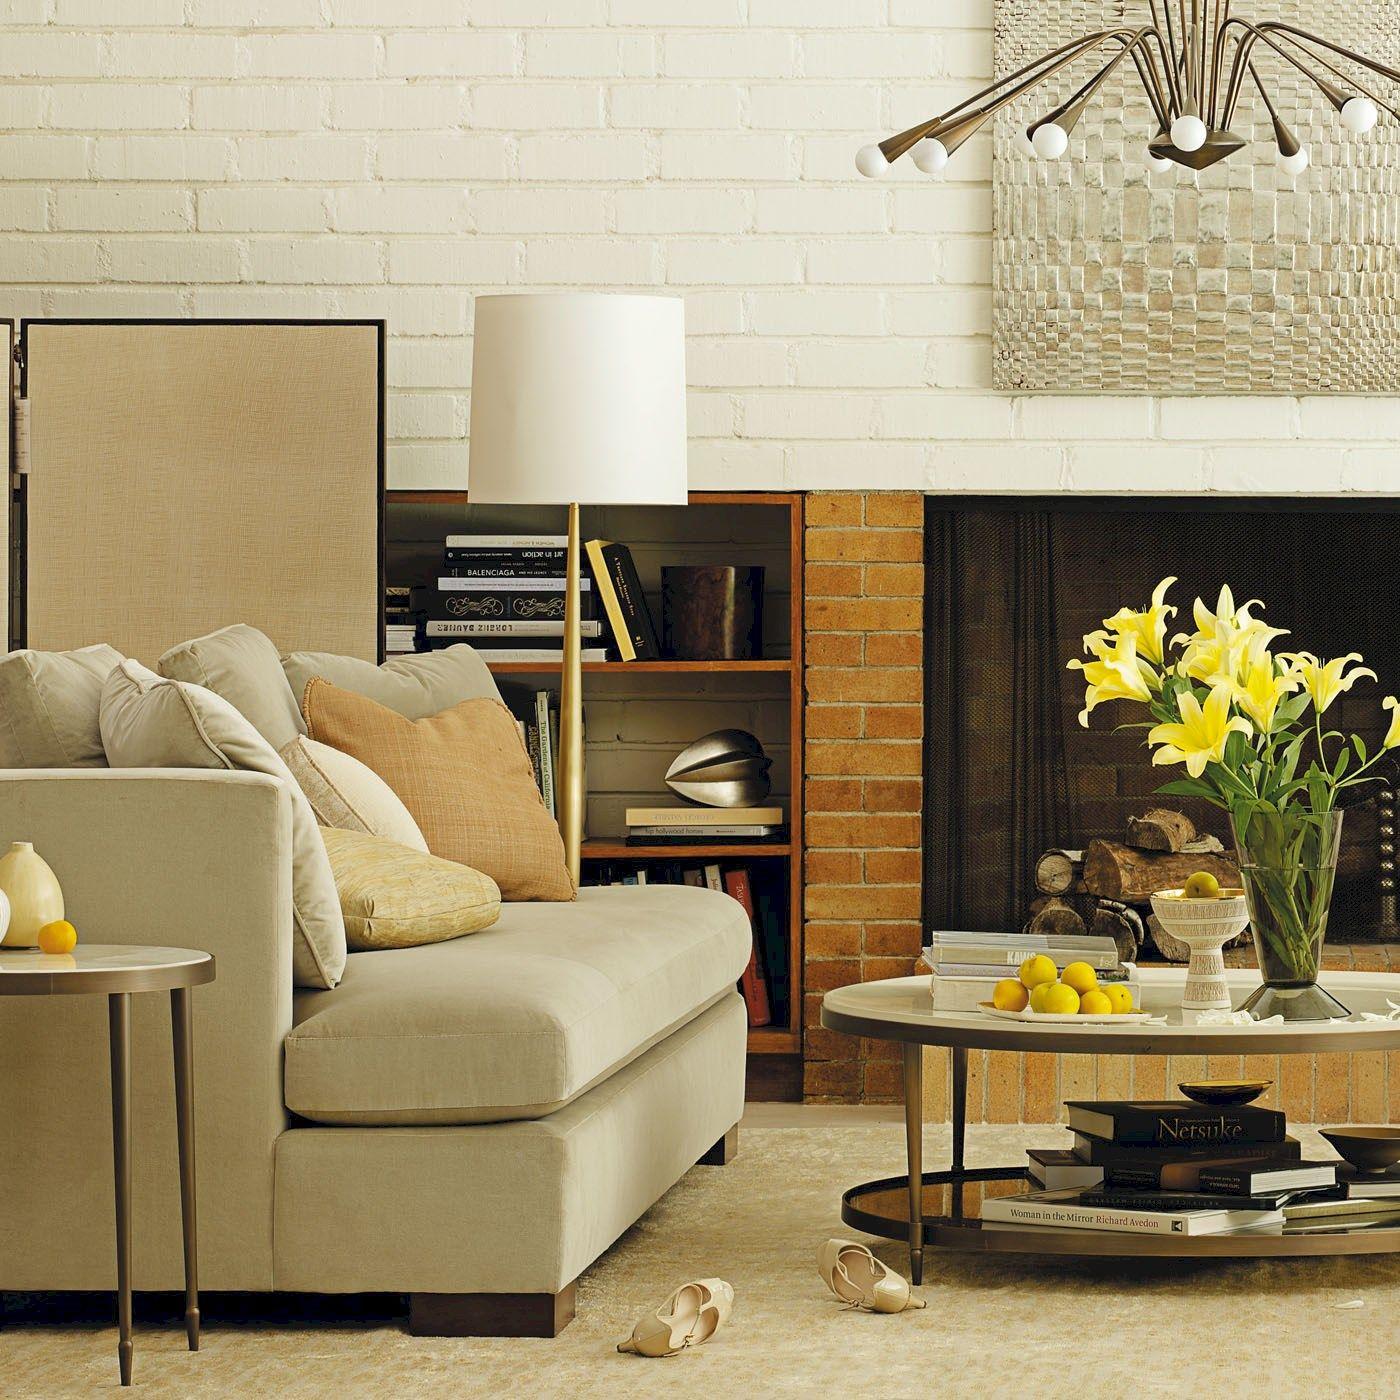 Lovely Barbara Barry / Baker Furniture / Tufenkian Carpet   Tempo Opal:  Https://www.tufenkianoutlet.com/p 4055 Arching Lattice Amethyst.aspx    Pinterest   Baker ...